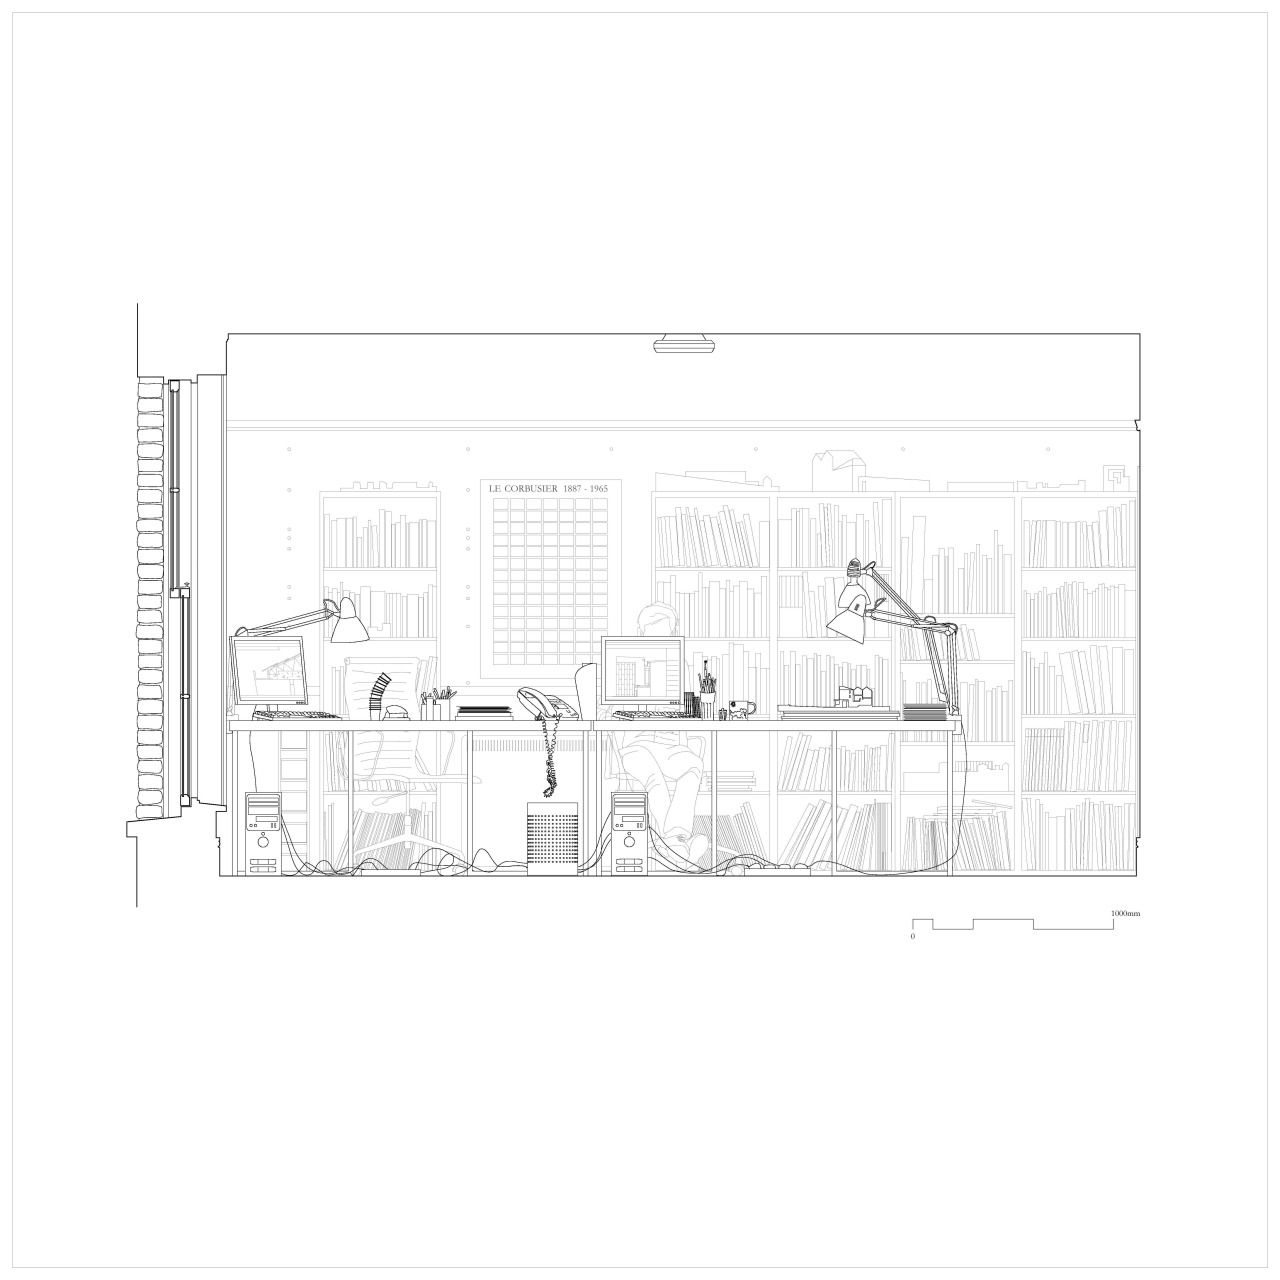 Plattenbaustudio 19a Baggot Street Elevation Drawing Of